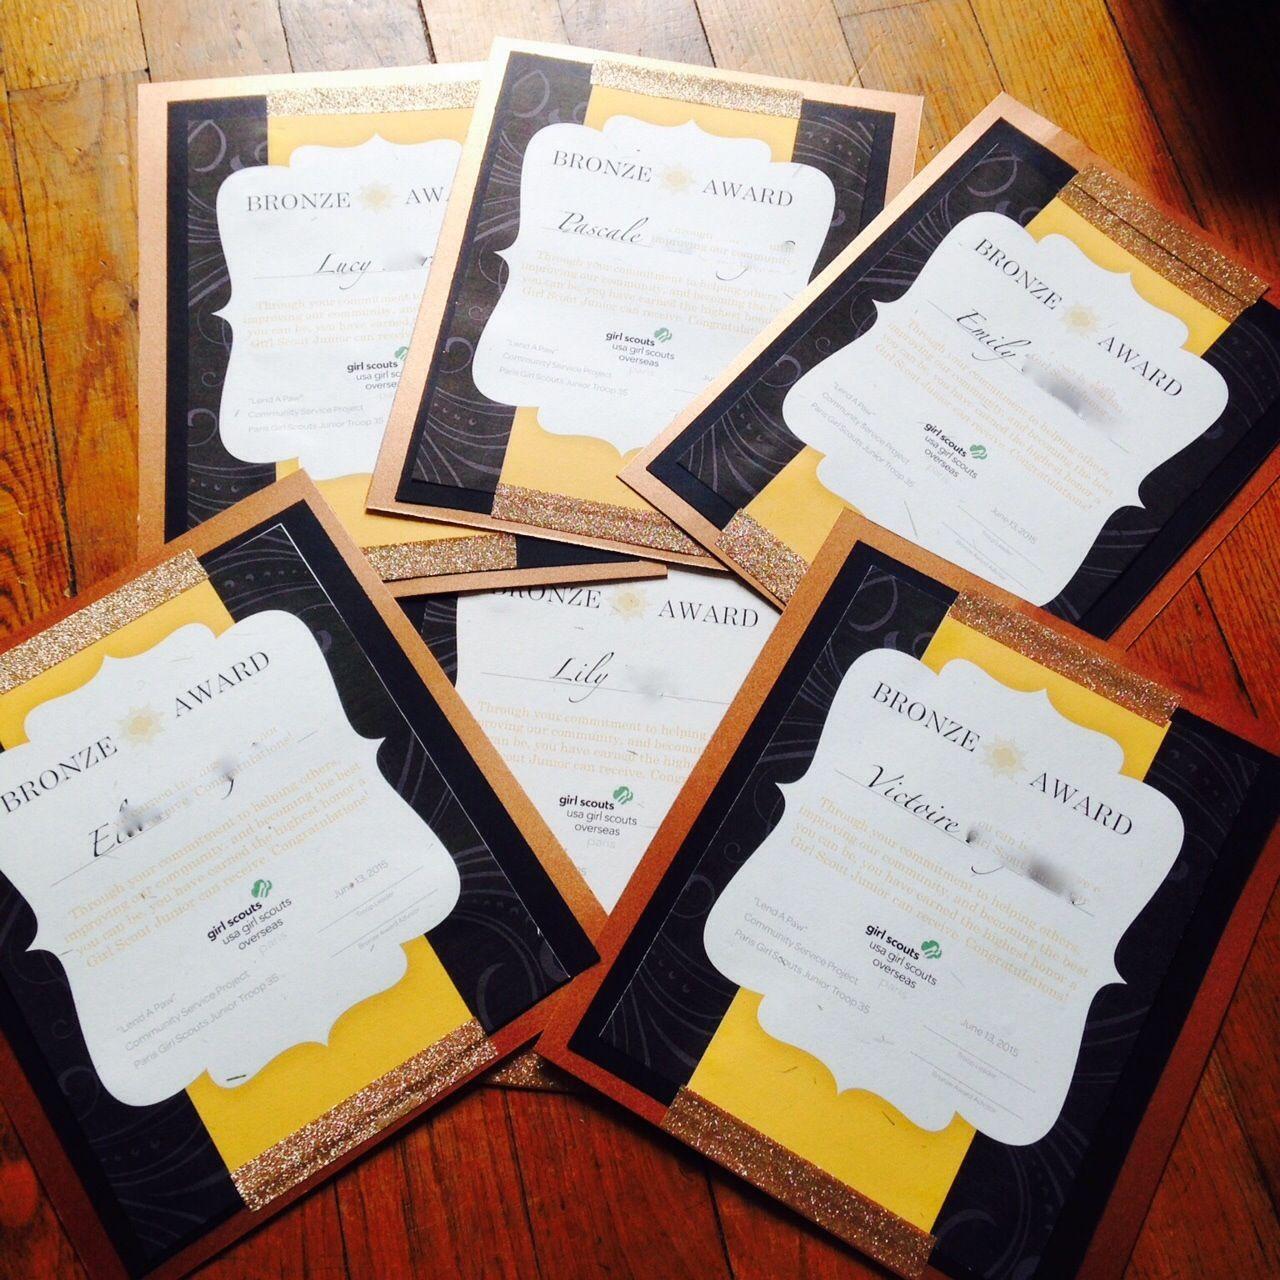 #GirlScout Bronze Award Certificates DIY Using #MSWord